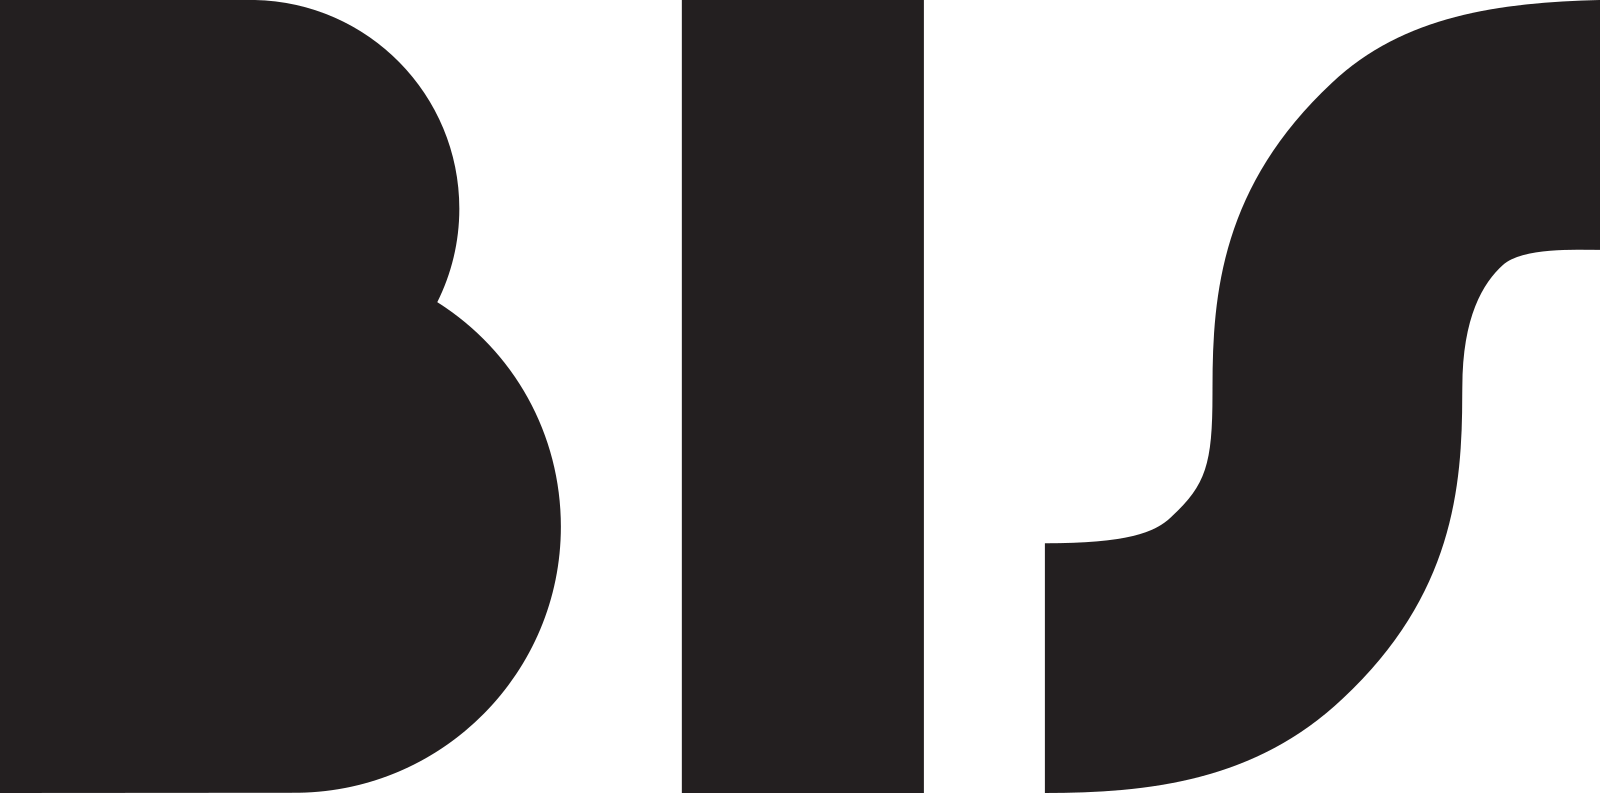 canal bis logo 4 - Canal Bis Logo